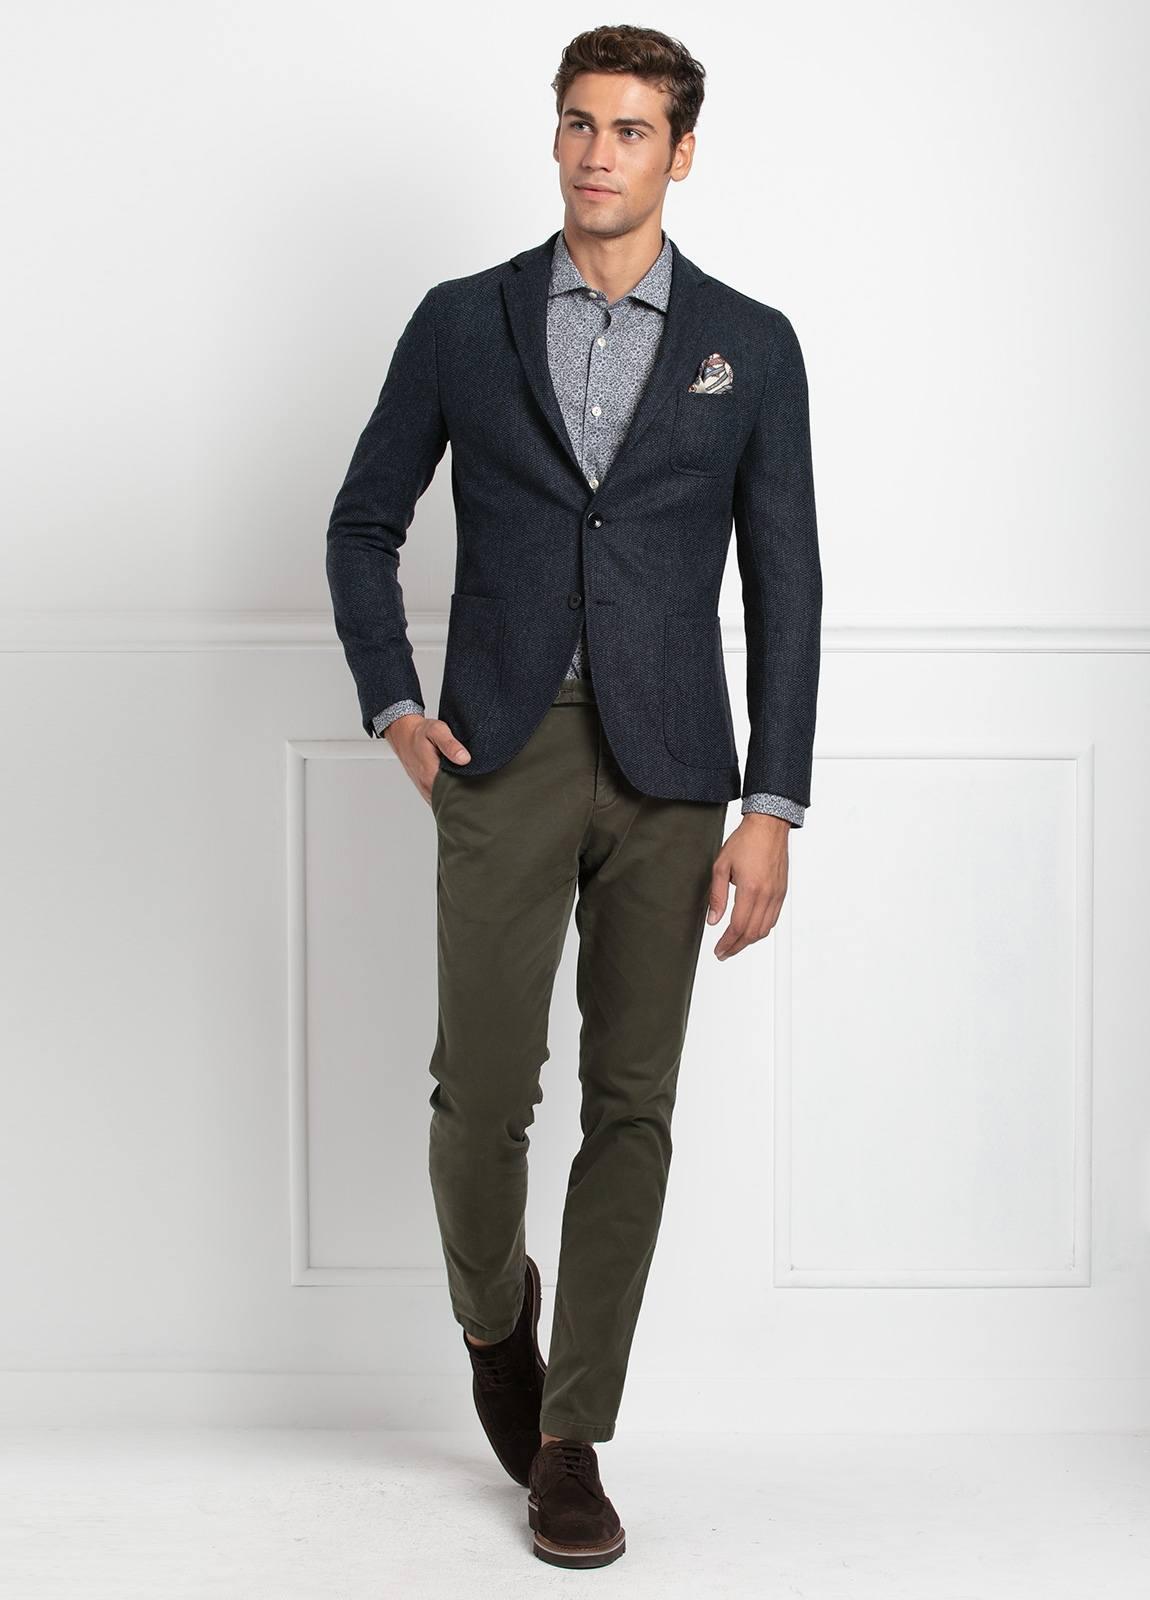 Americana SOFT JACKET Slim Fit, tejido textura color azul oscuro. 97% Lana, 3% Cashmere.